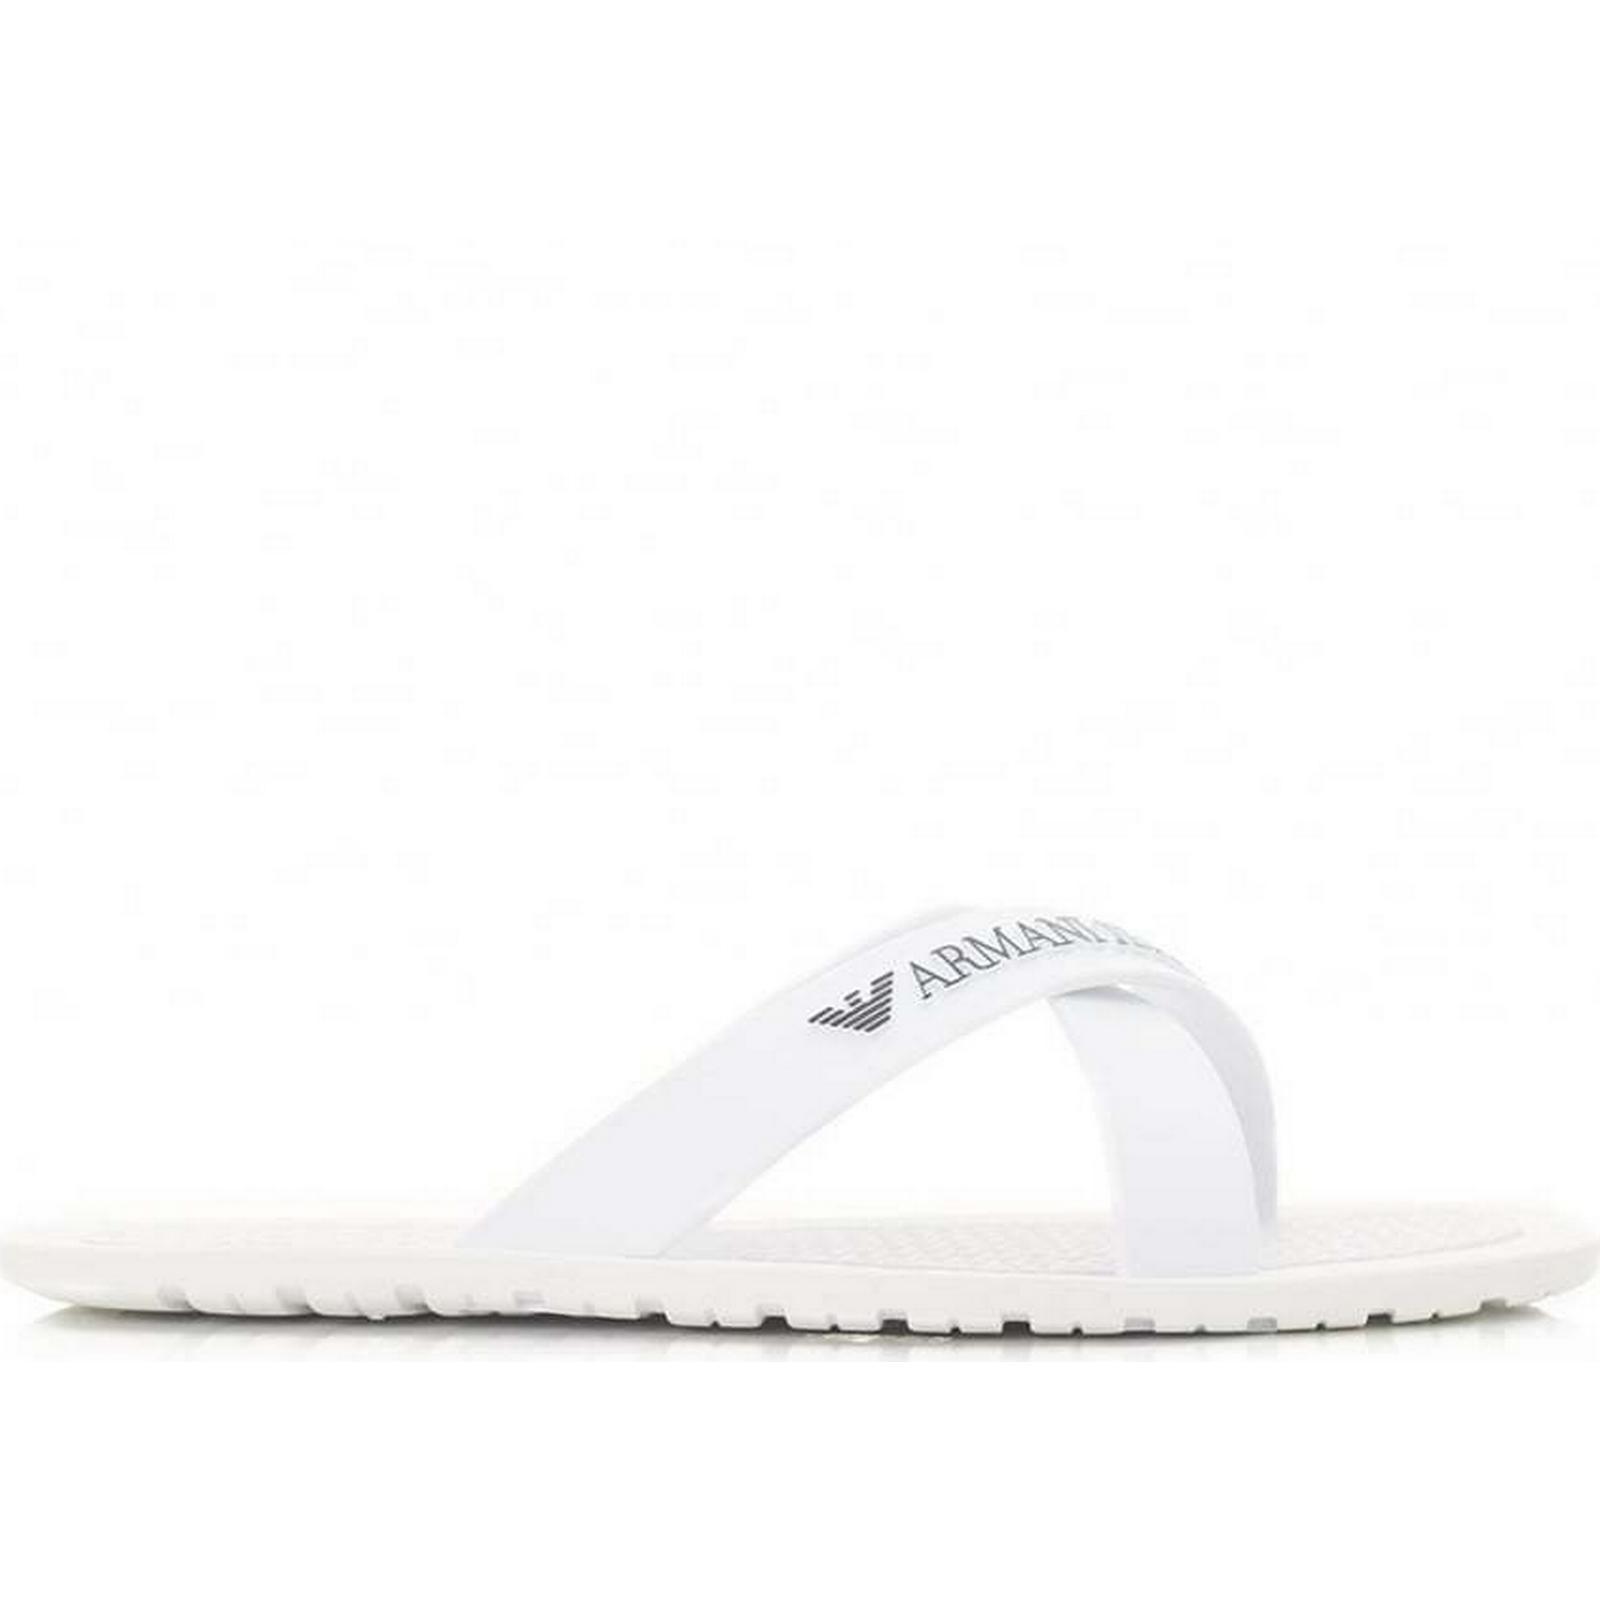 Armani Footwear Cross Over Size: Flip Flops Colour: BLACK, Size: Over 9 e52011